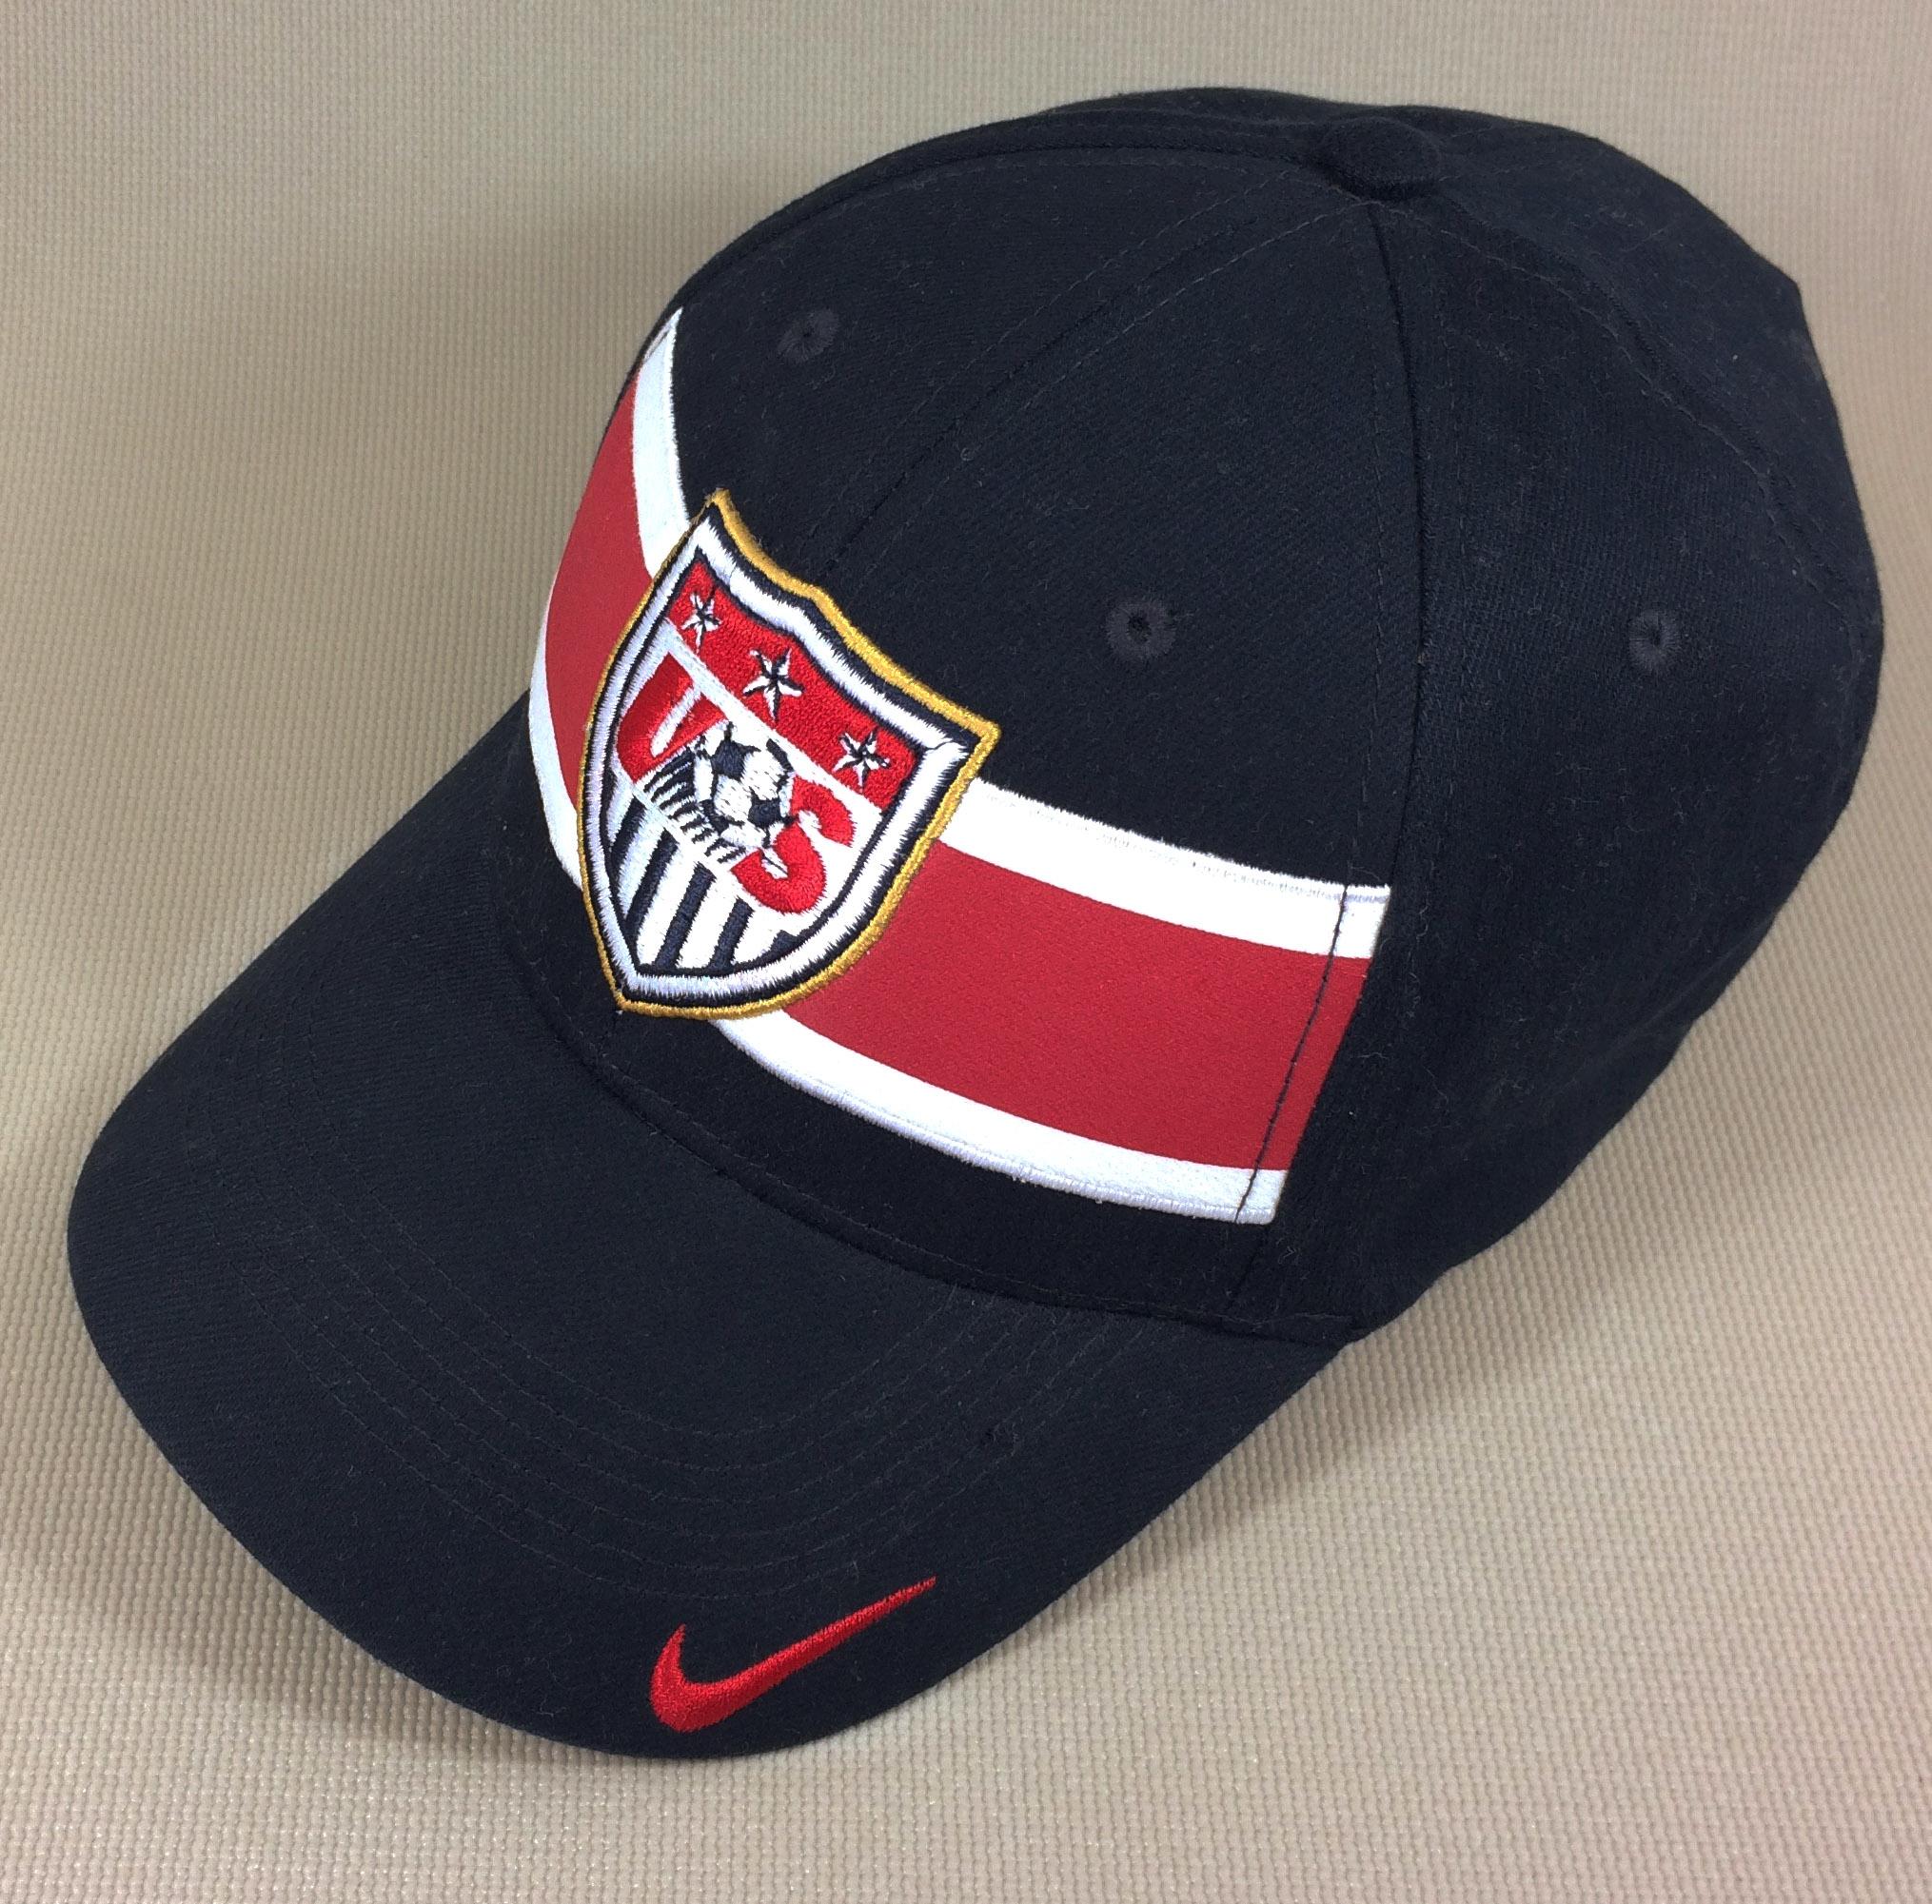 d034e7bef2d ... authentic us soccer nike cap 0fd7b b6404